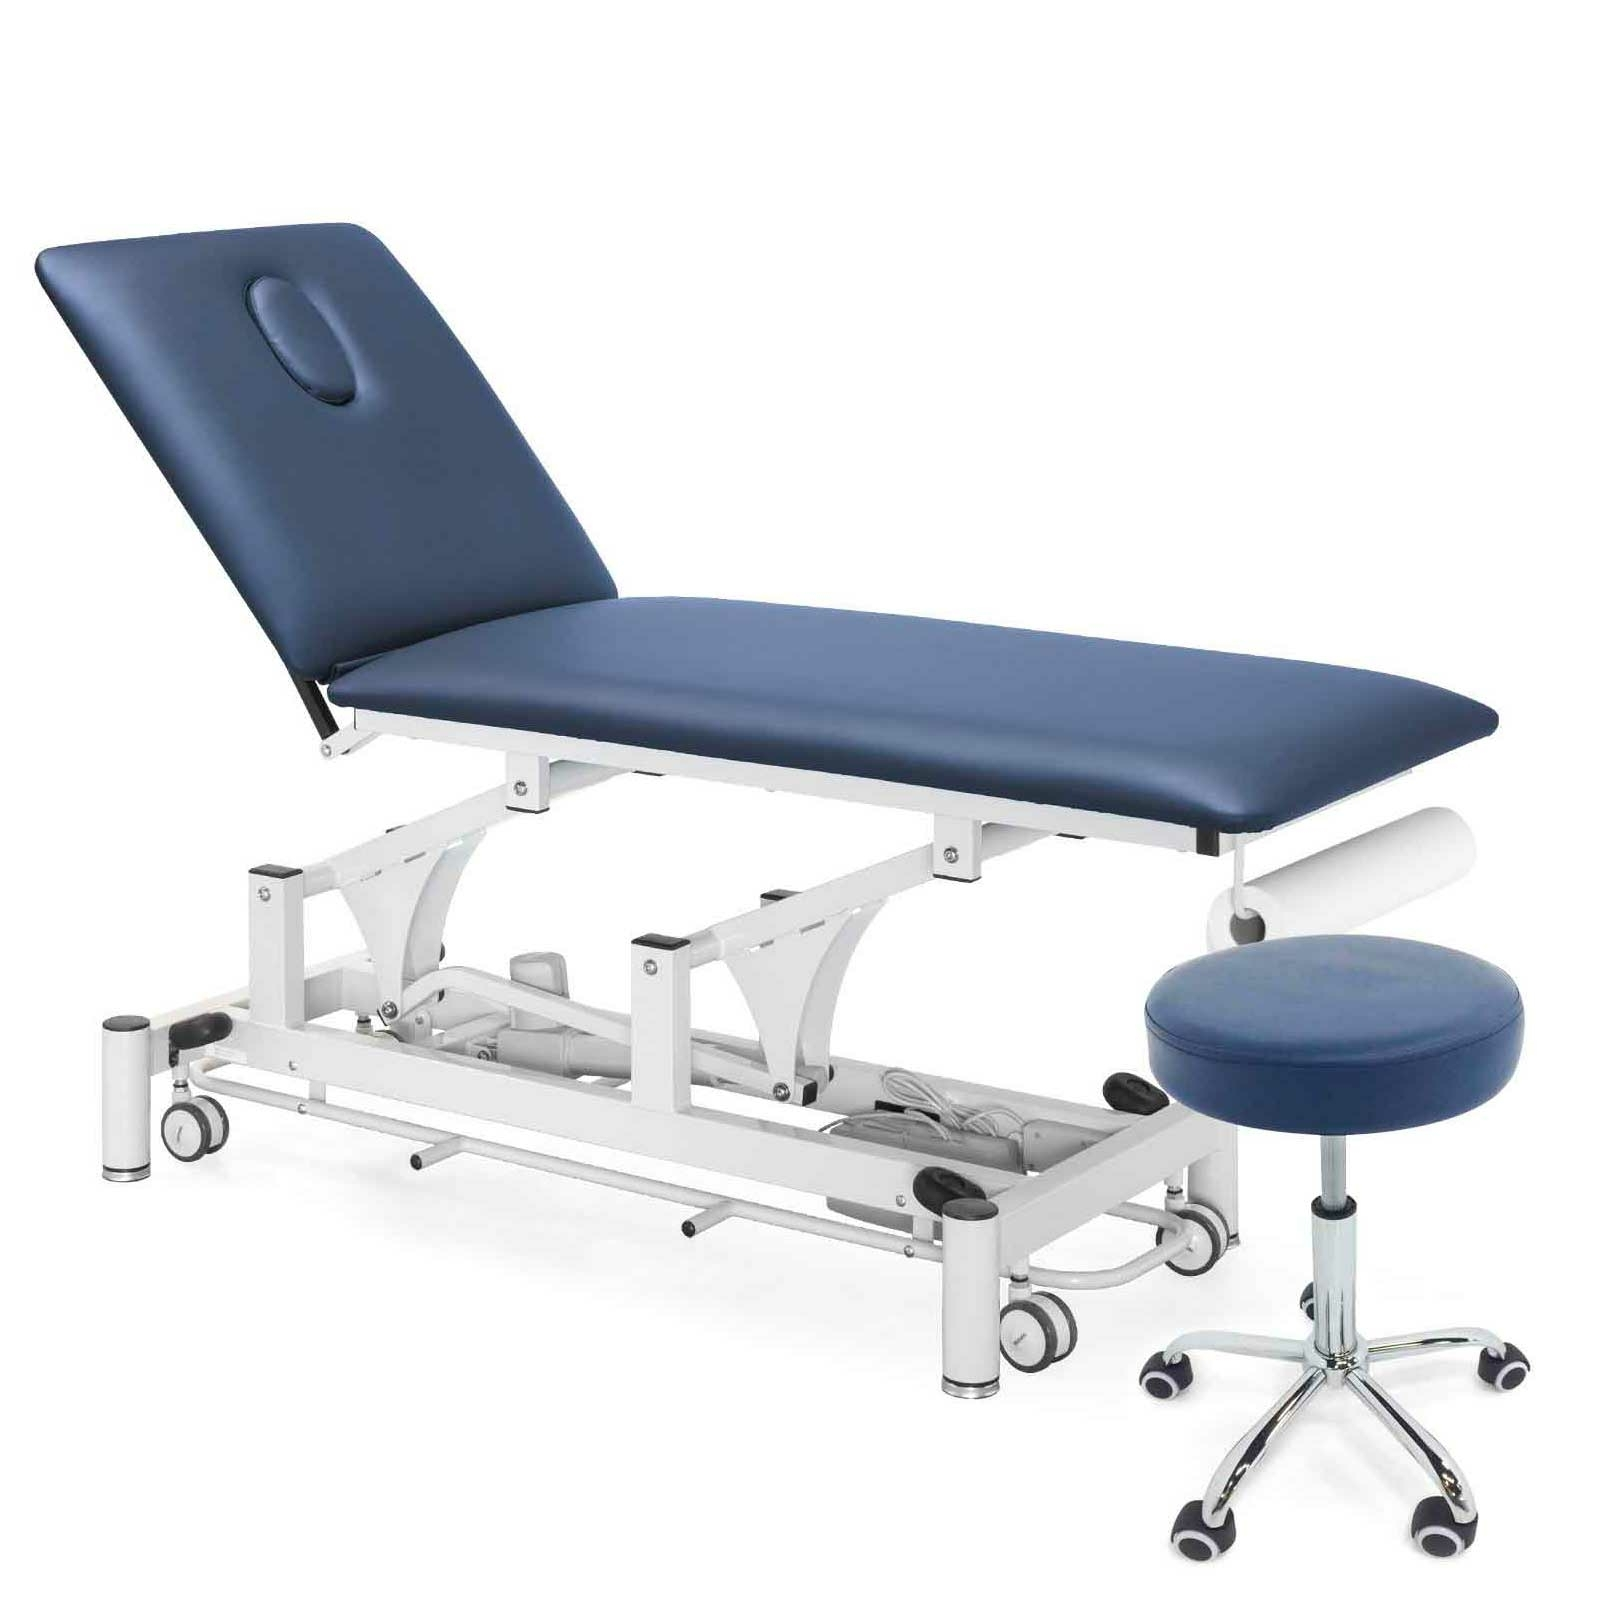 Table PhysioPRO bleu marine avec housse et tabouret assortis